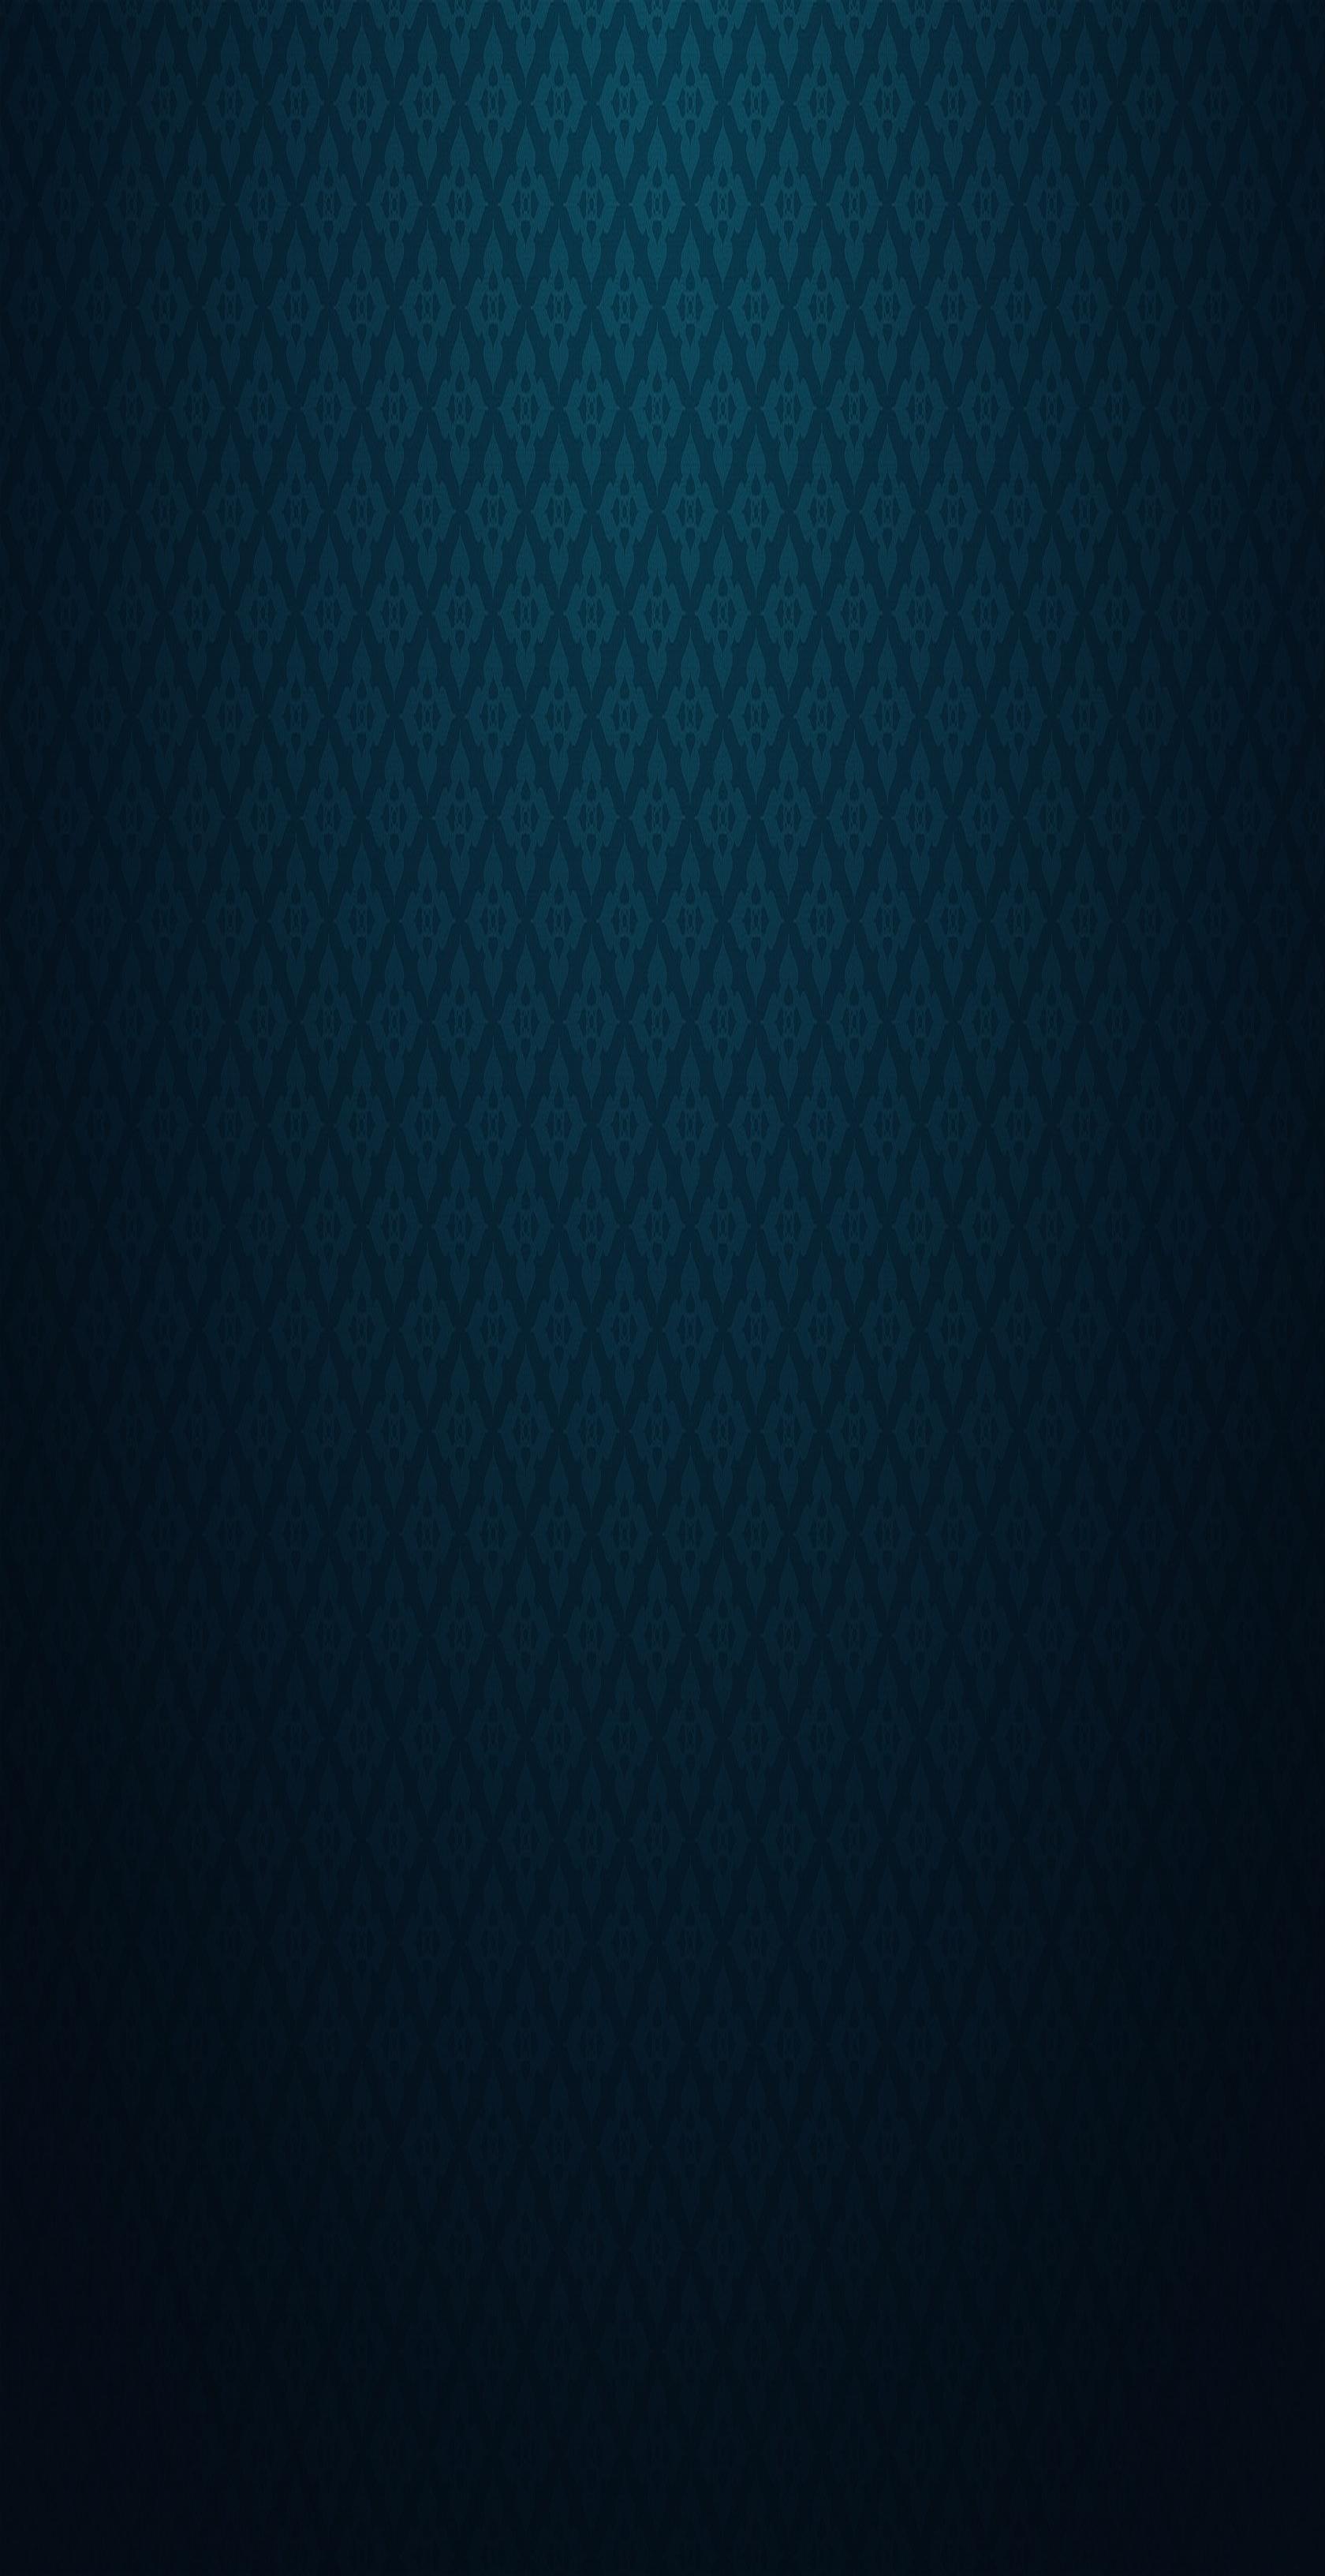 Minimalist Desktop Dark Blue Wallpapers - Wallpaper Cave